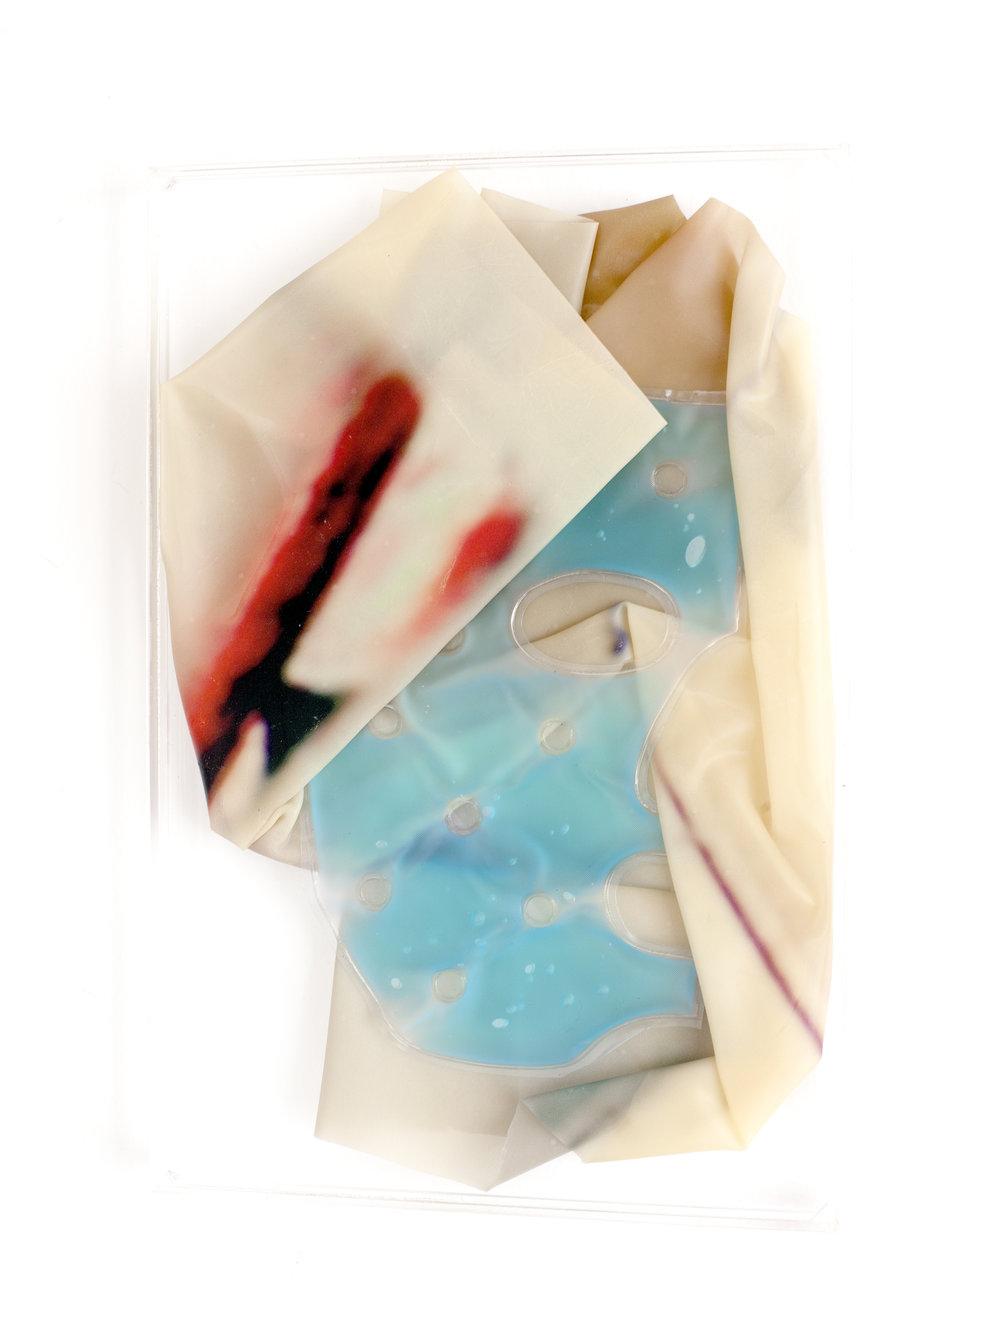 SCREWY, 2018, sculpture (unique), 30 X 20 x 1,6 cm, inkjetprint on latex, transparent acrylic, ½ face gel mask